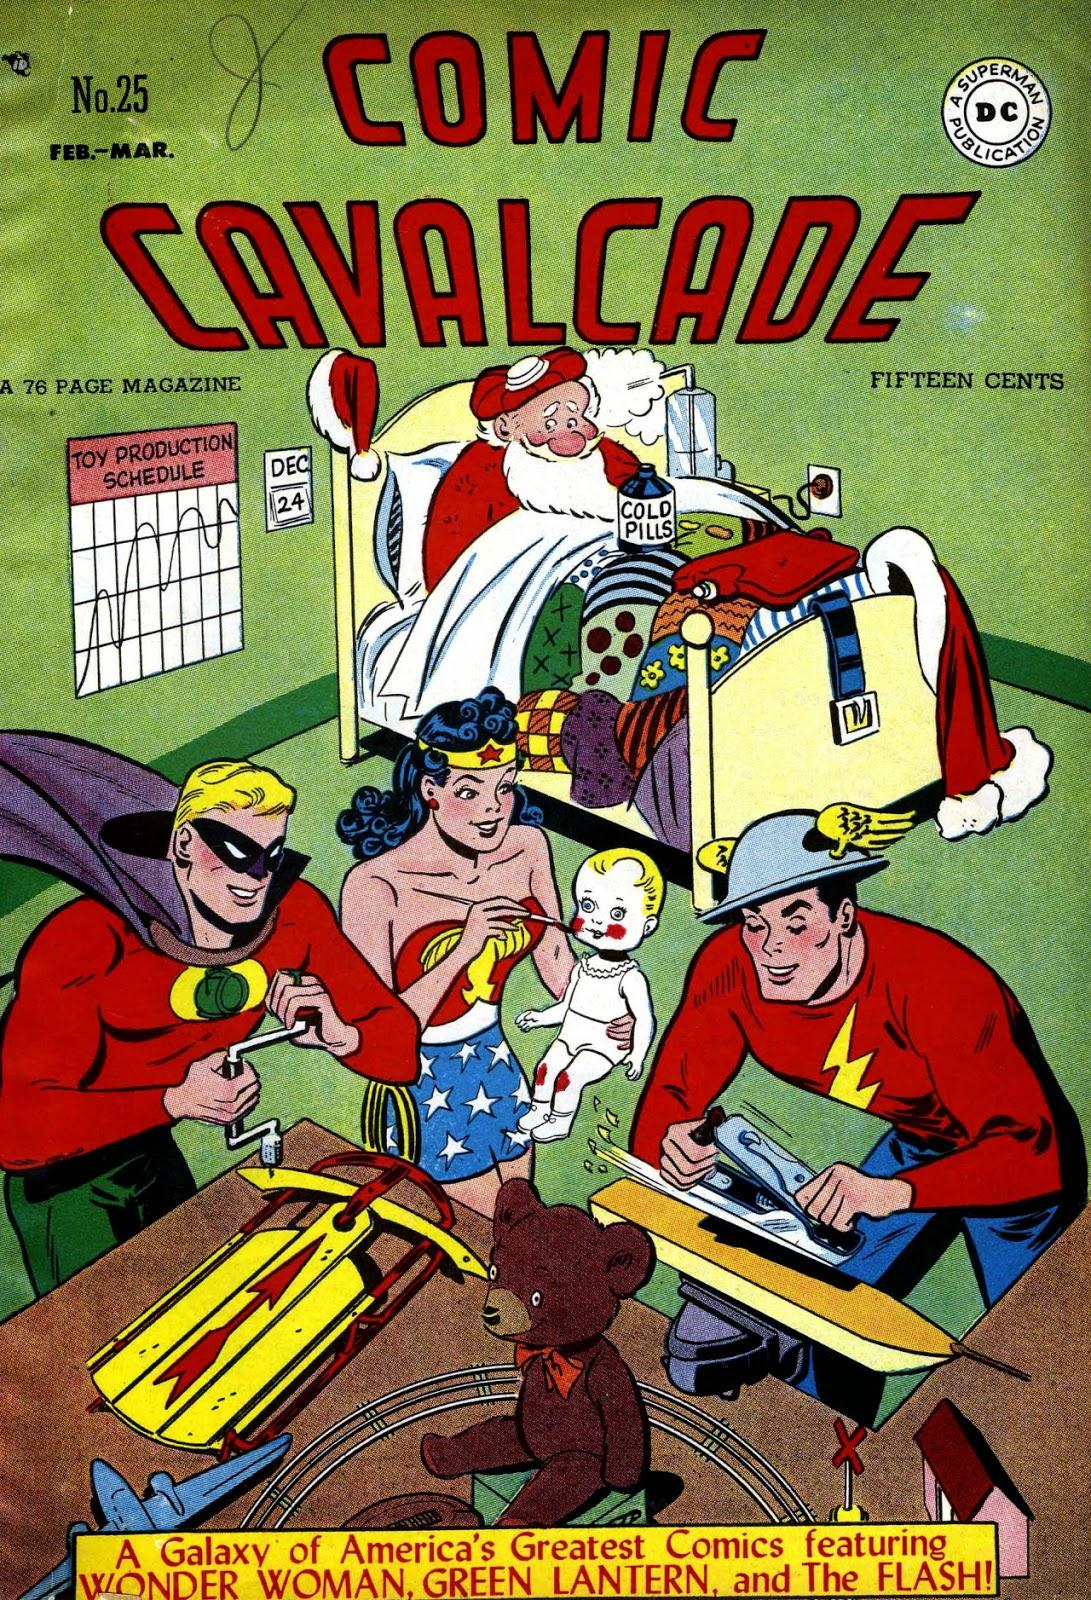 Comic Calvalcade #25